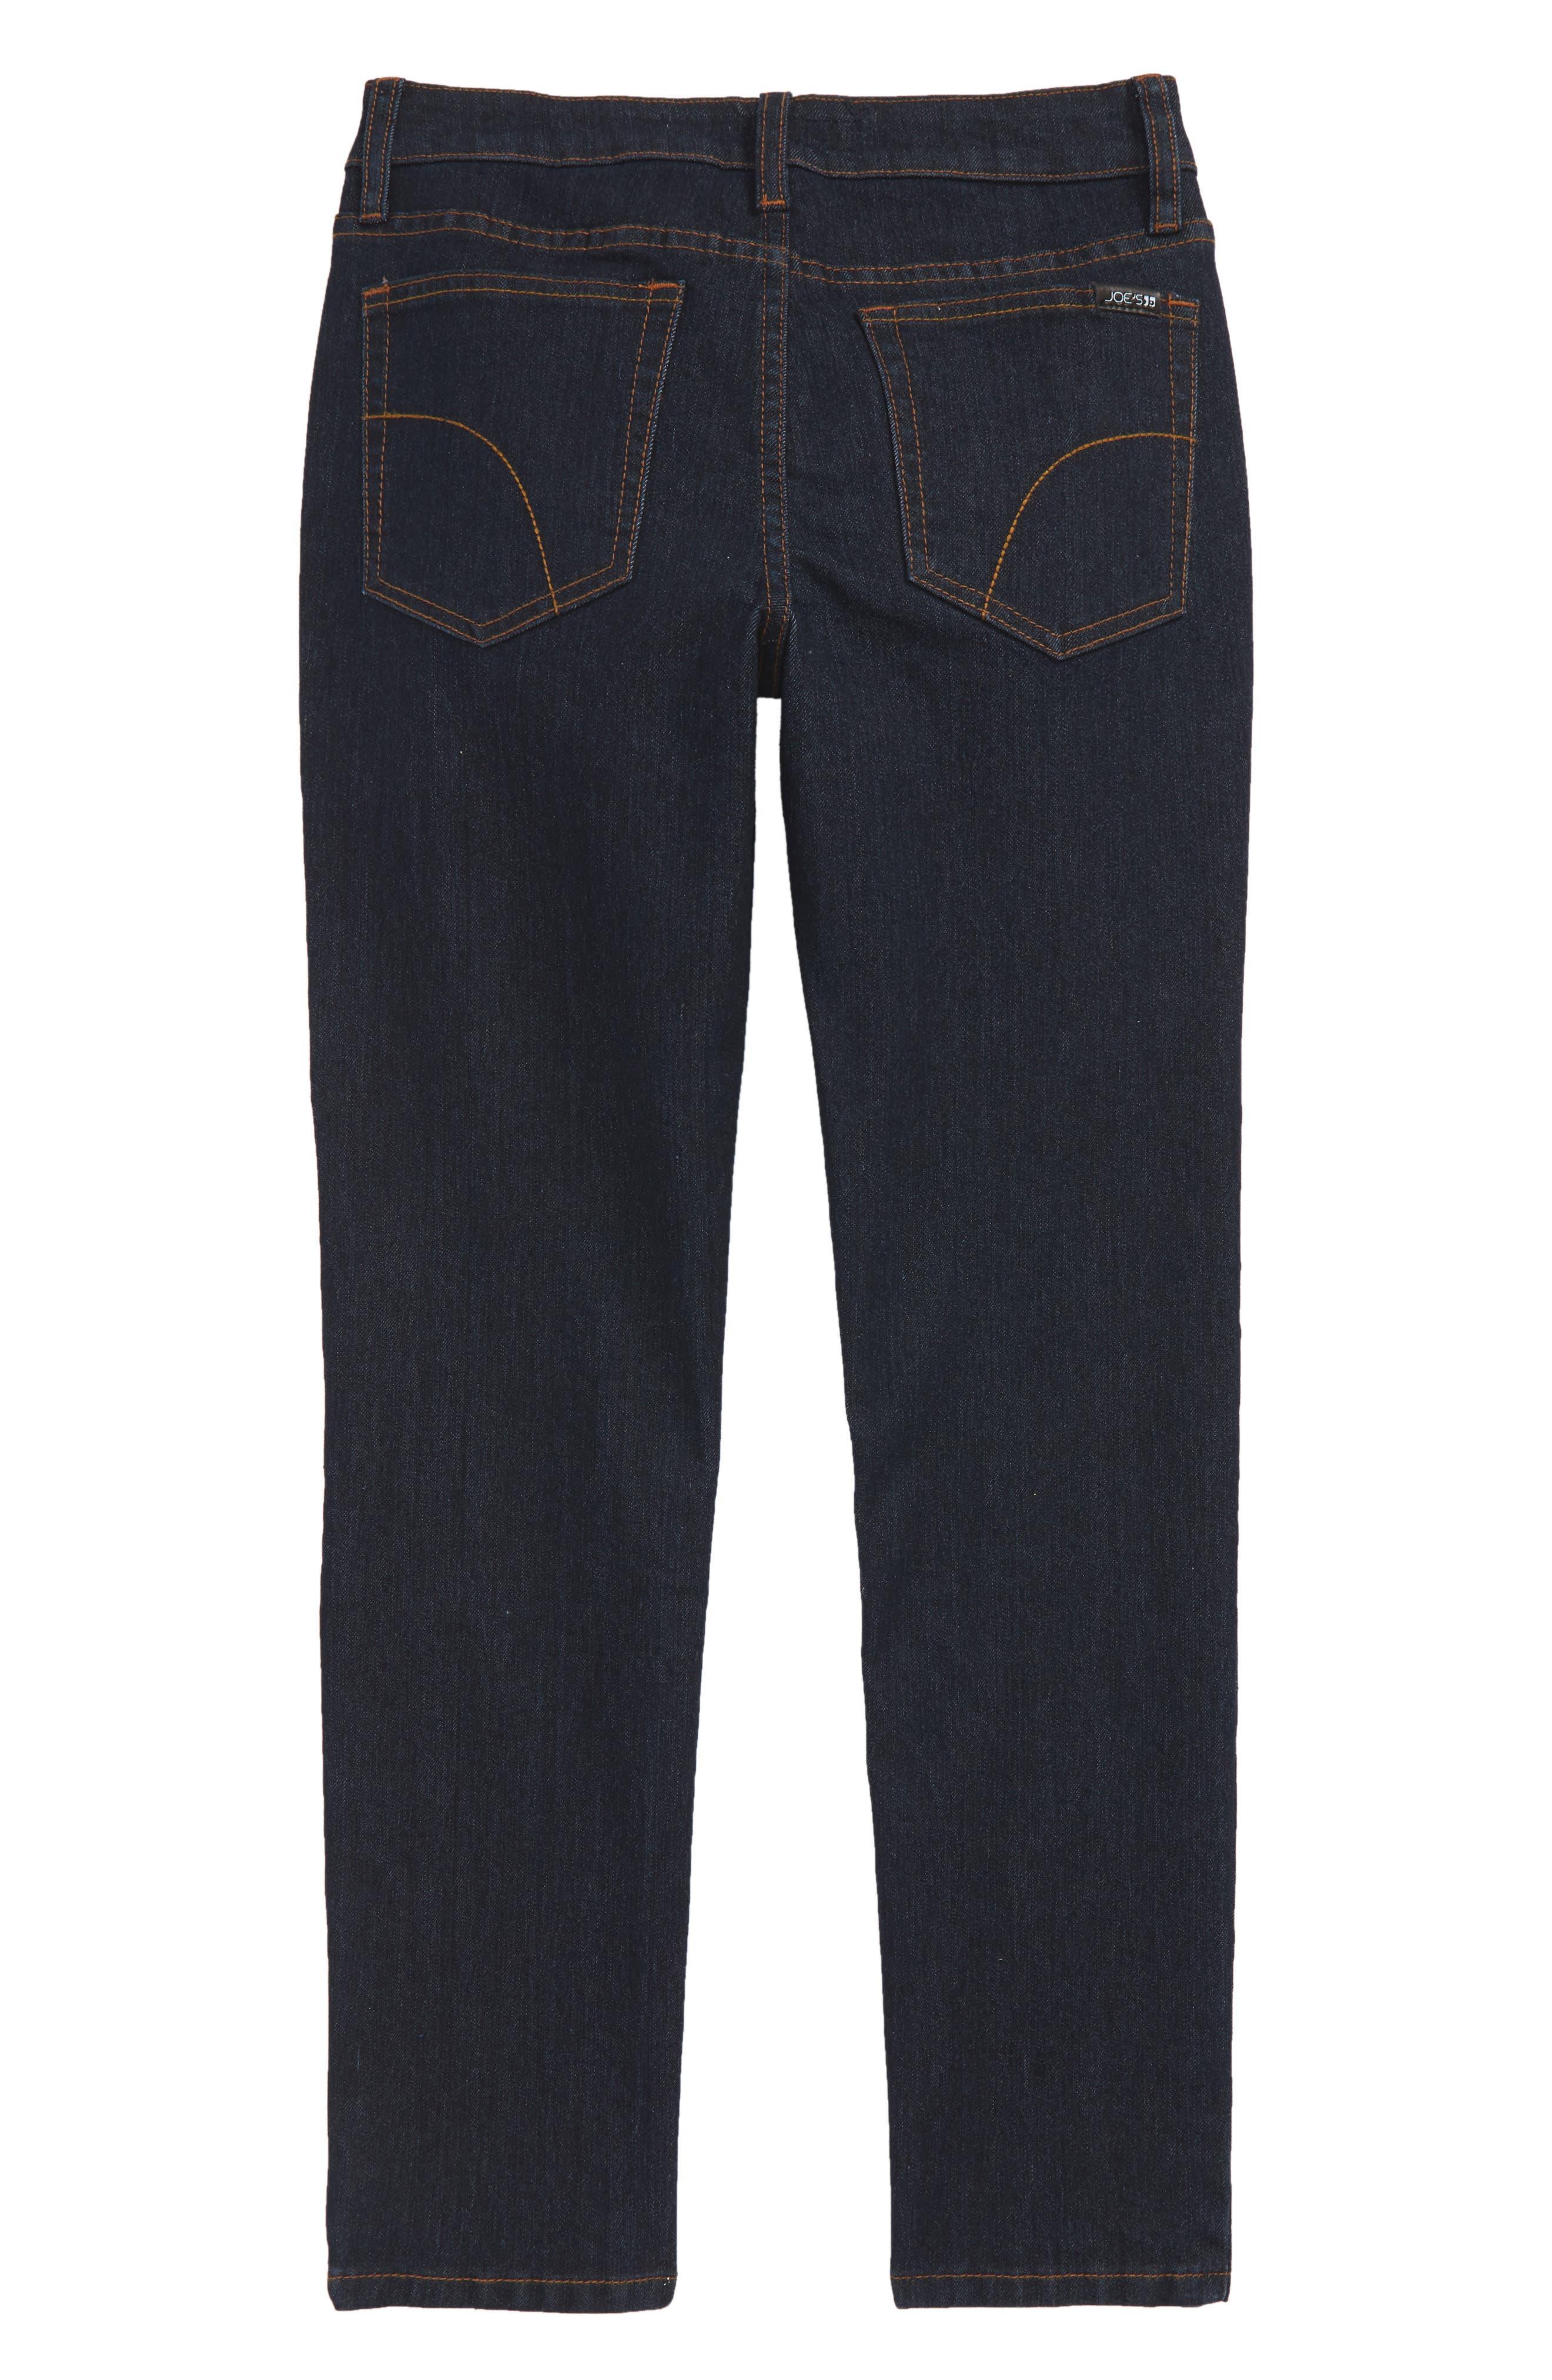 Brixton Straight Leg Stretch Jeans,                             Alternate thumbnail 2, color,                             RINSE